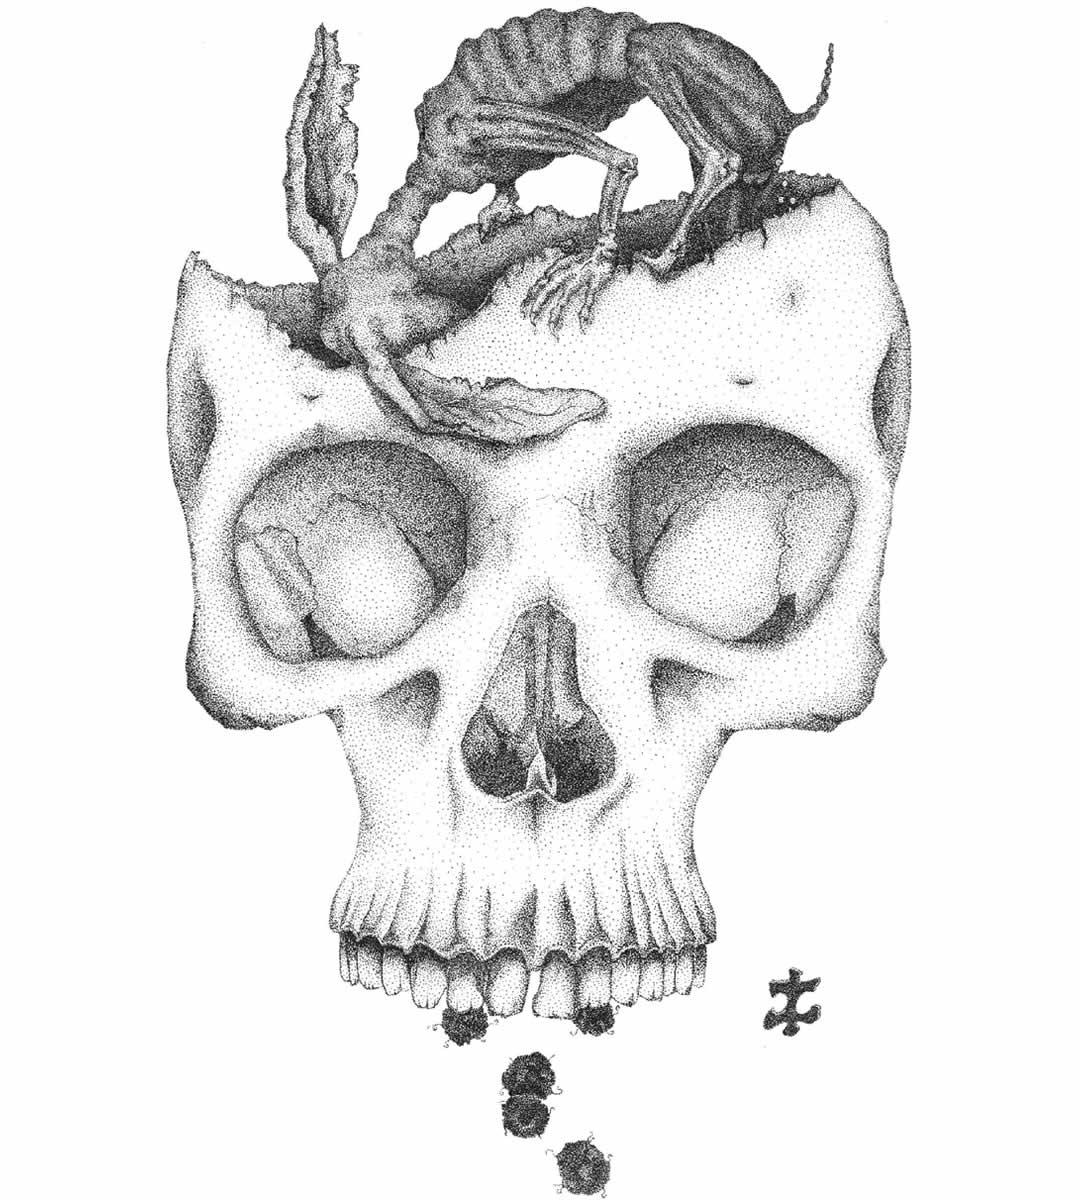 skull-droppings